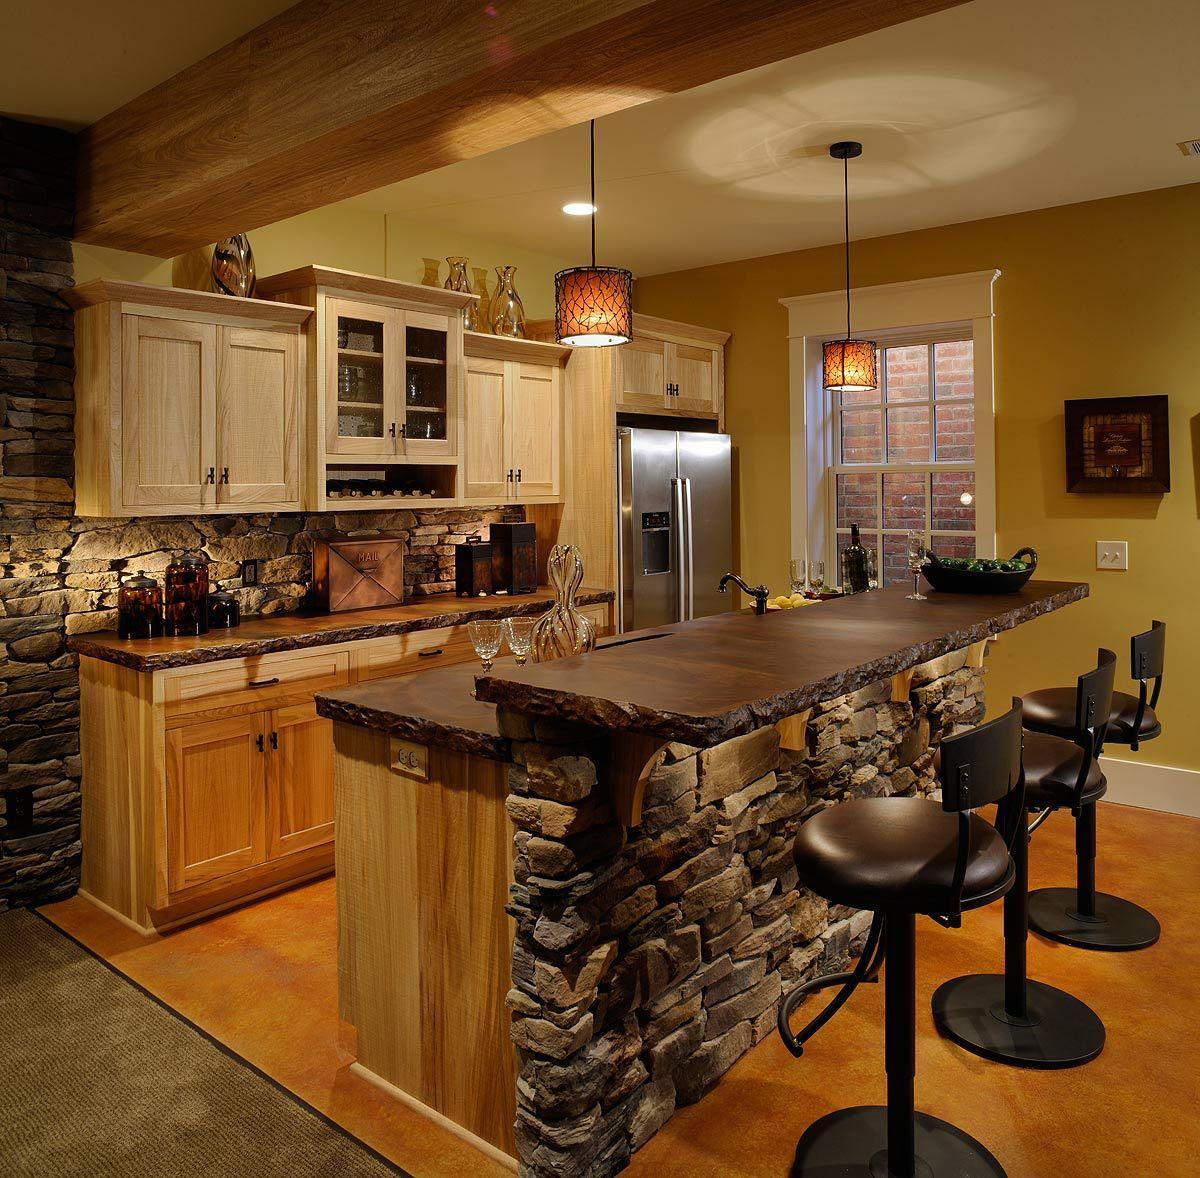 Bar Room Ideas For A Kitchen   Rumah, Desain, Mebel